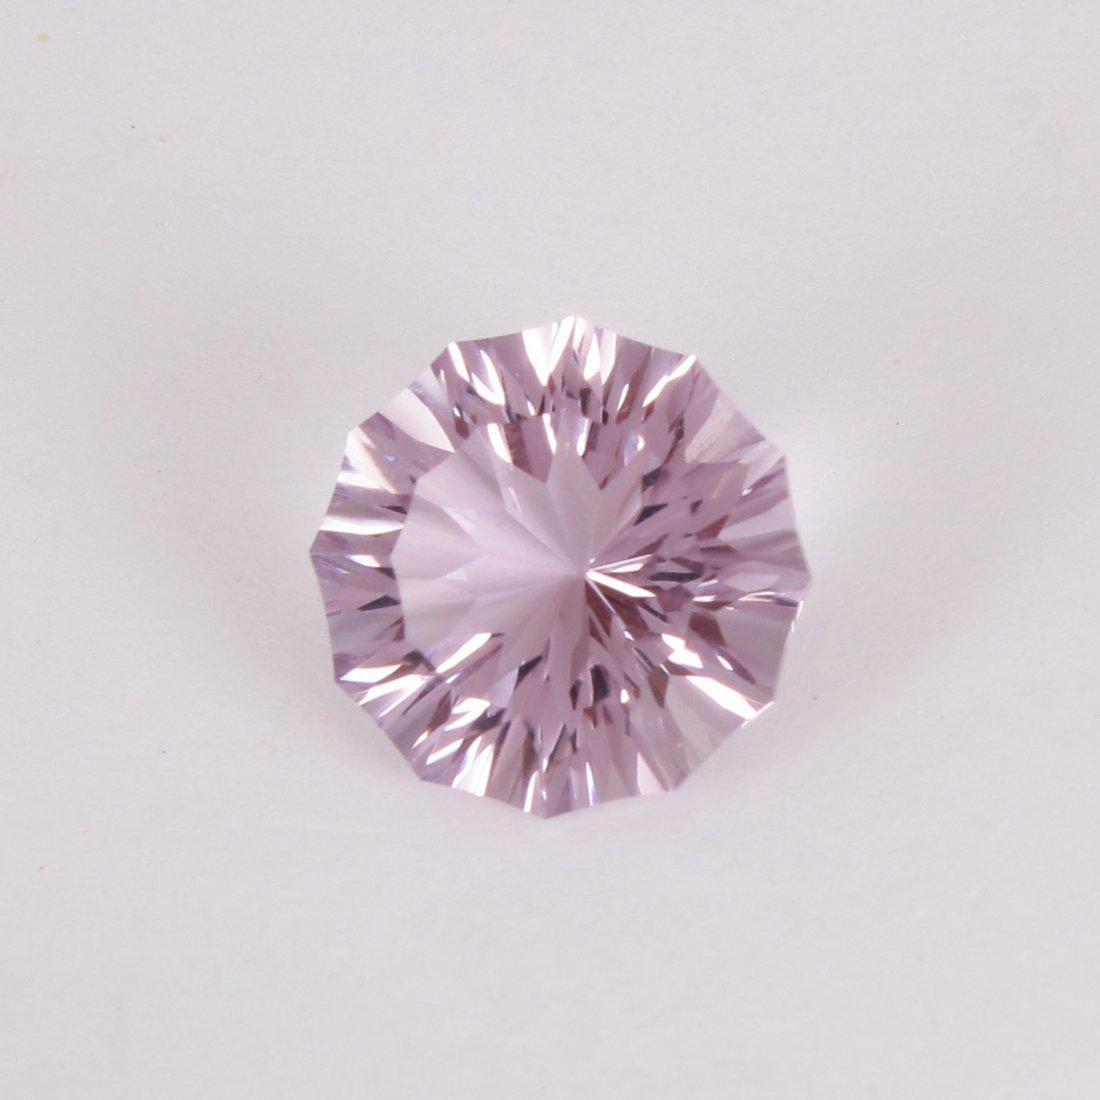 GFCO Cert. 7.97 ct. Pink Purple Amethyst - BRAZIL